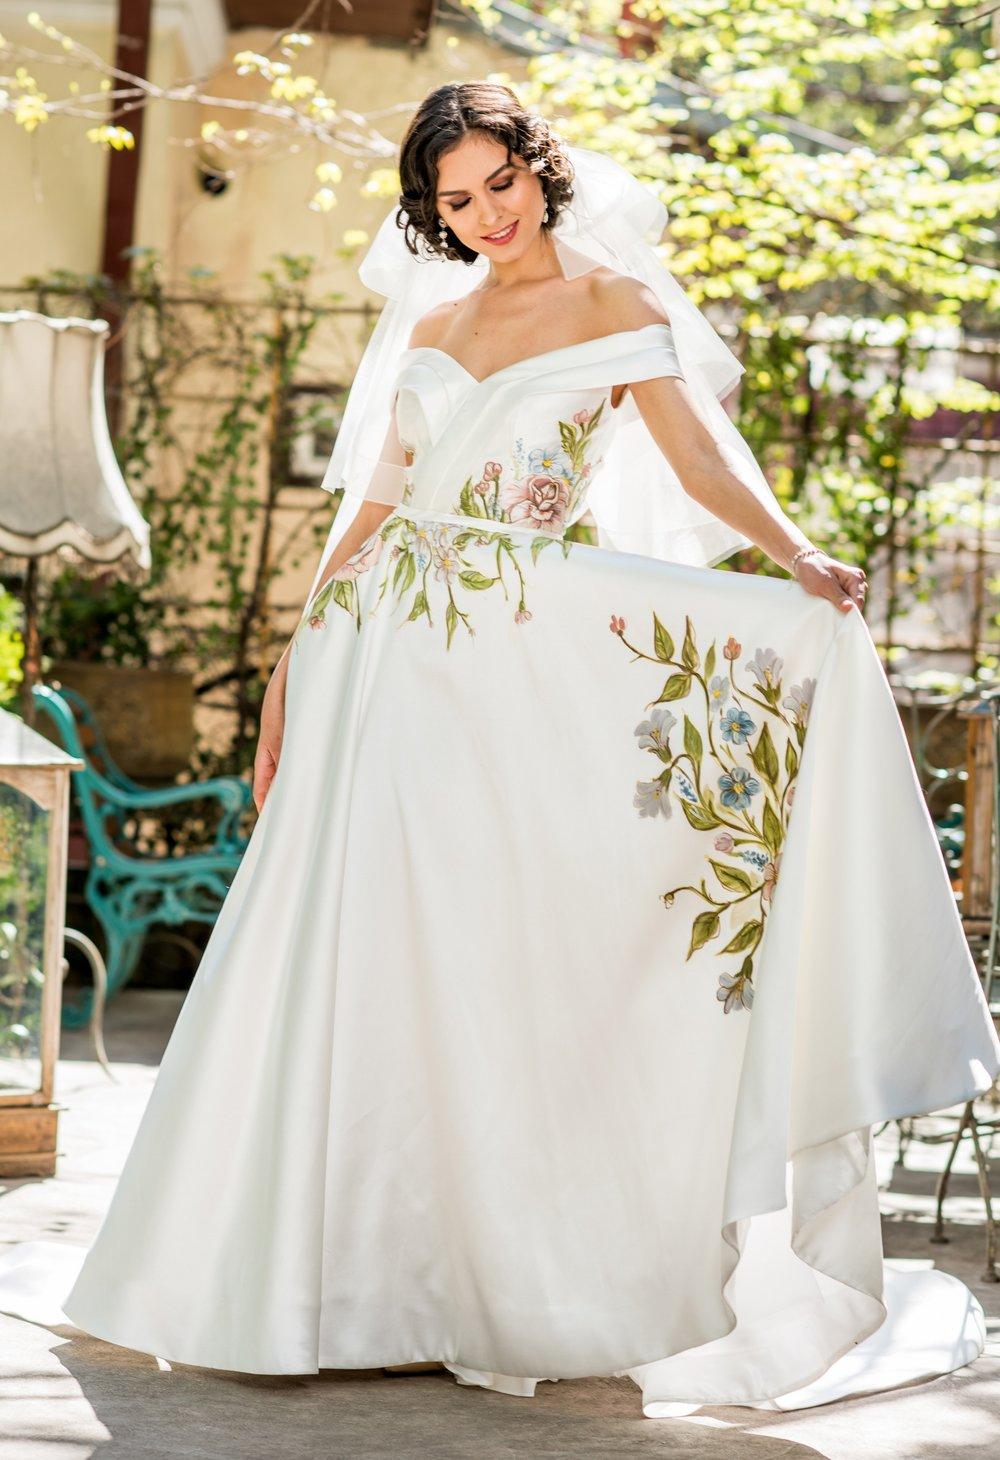 2018 wedding dresses fashion by laina (69).jpg